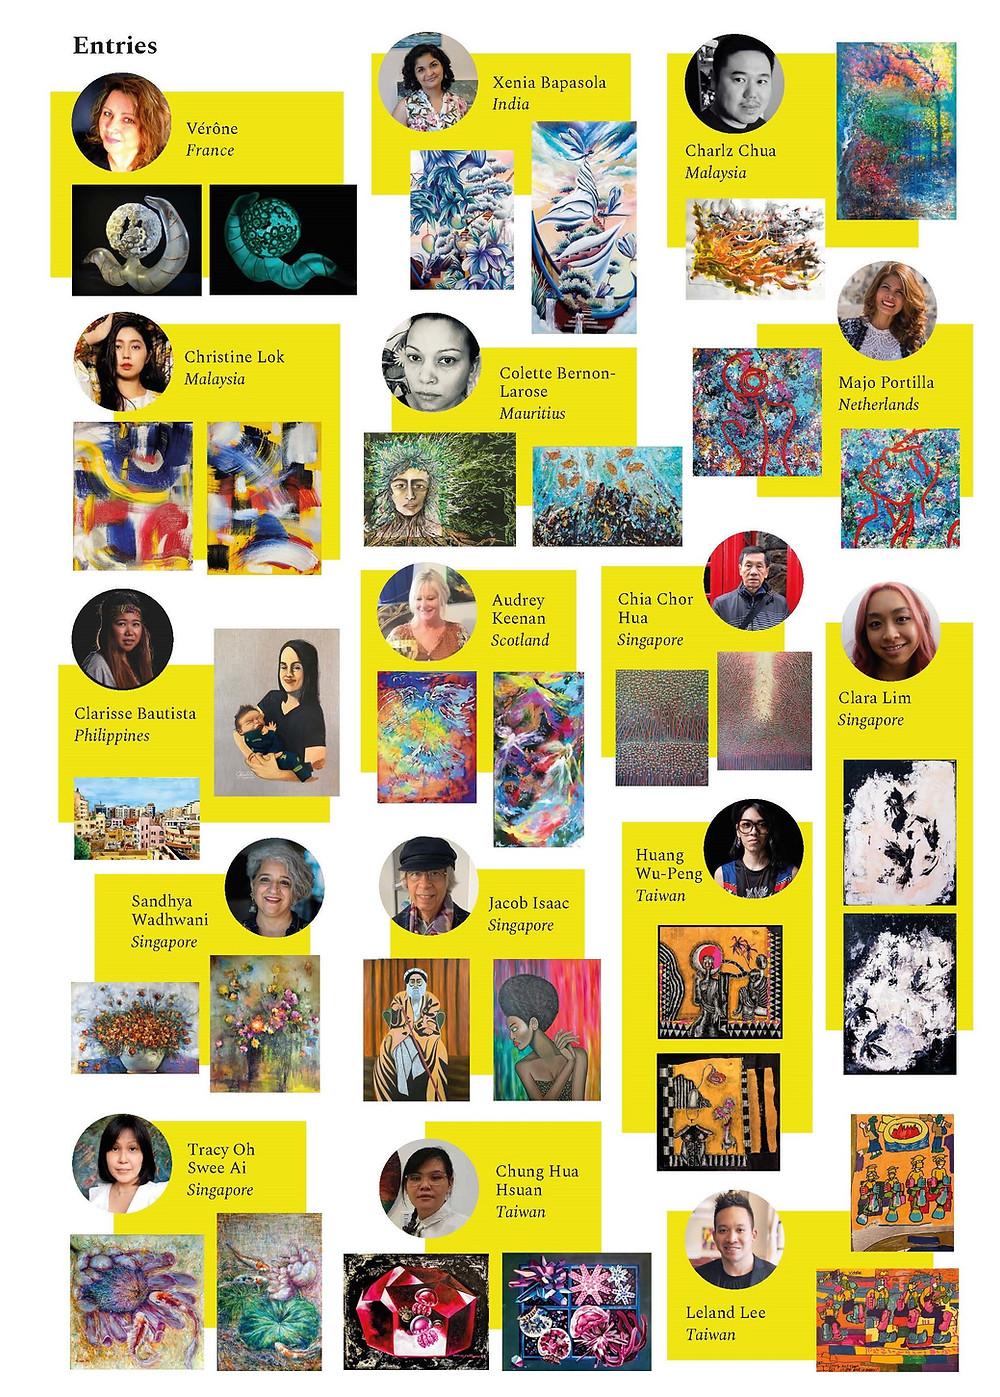 Art Herald Magazine, The Collector's Award, Studio-ID Art Gallery, Global Art Competition, Nidhi Samani, Deborah Henry-Pollard, Joan Marie Kelly, Gerald Tay